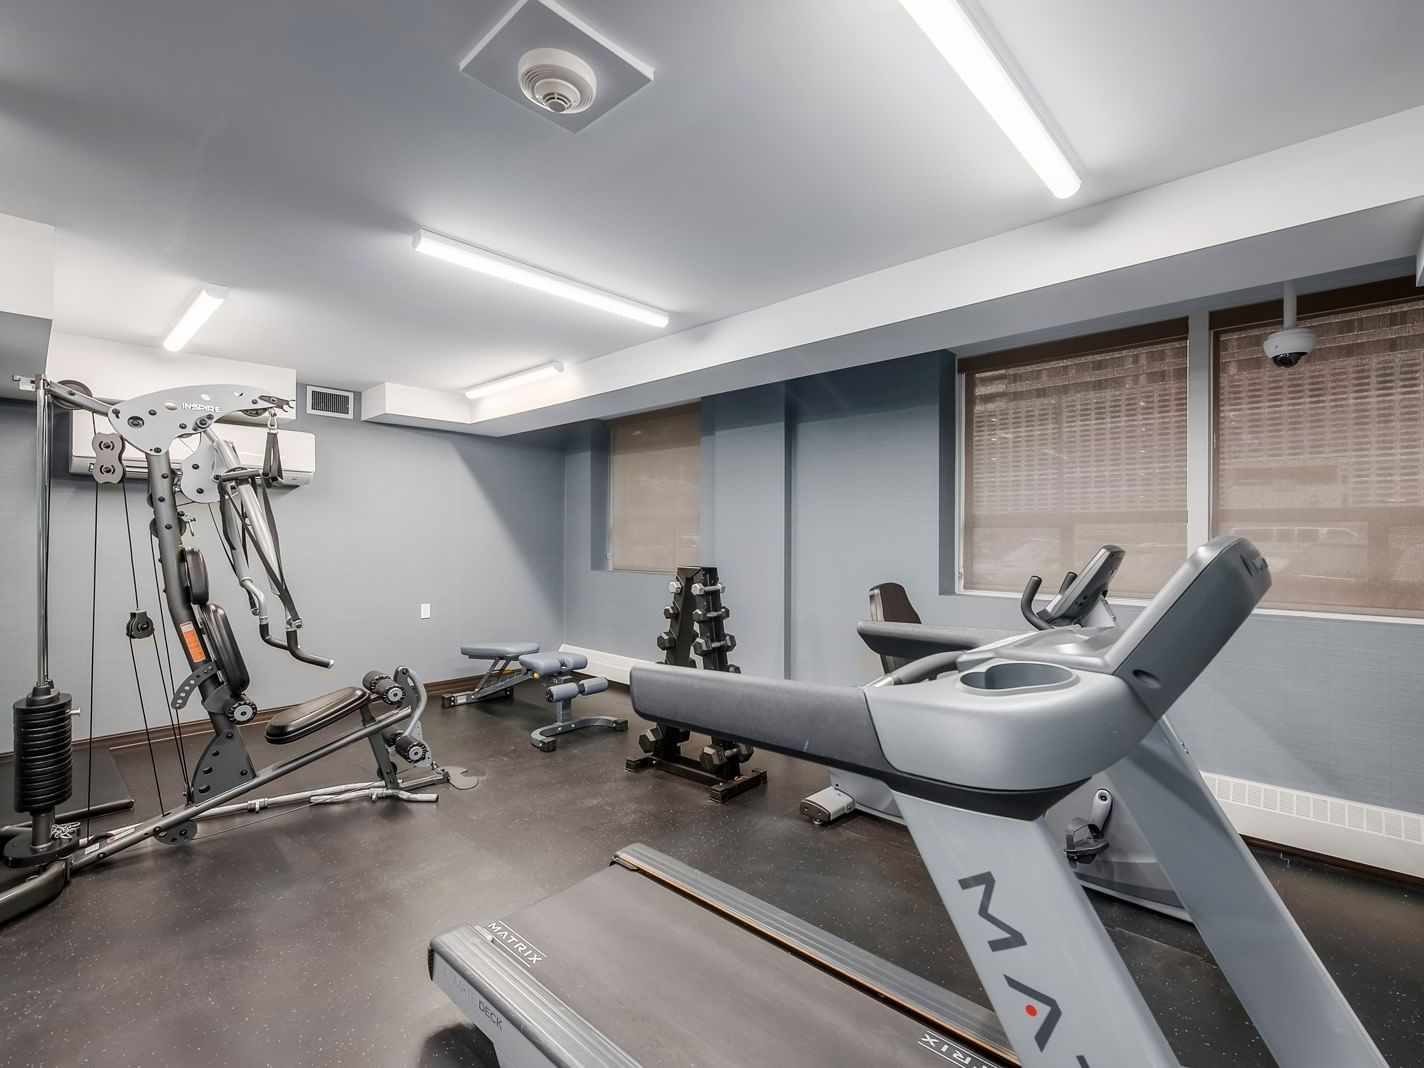 gym with treadmill